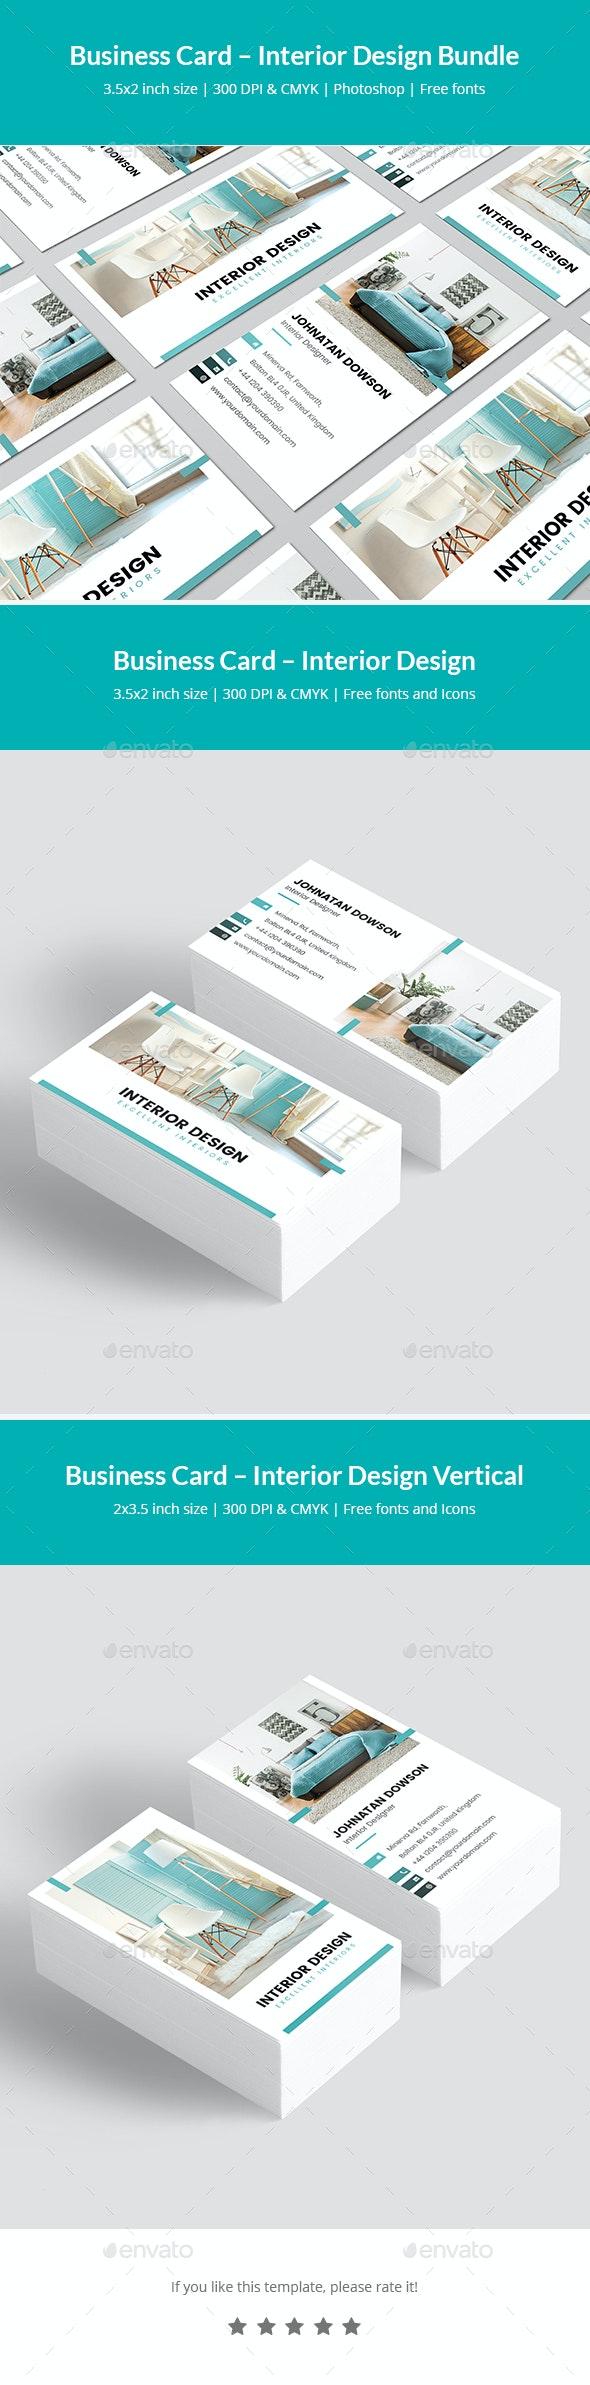 Business Card – Interior Design Bundle Print Templates 2 in 1 - Corporate Business Cards